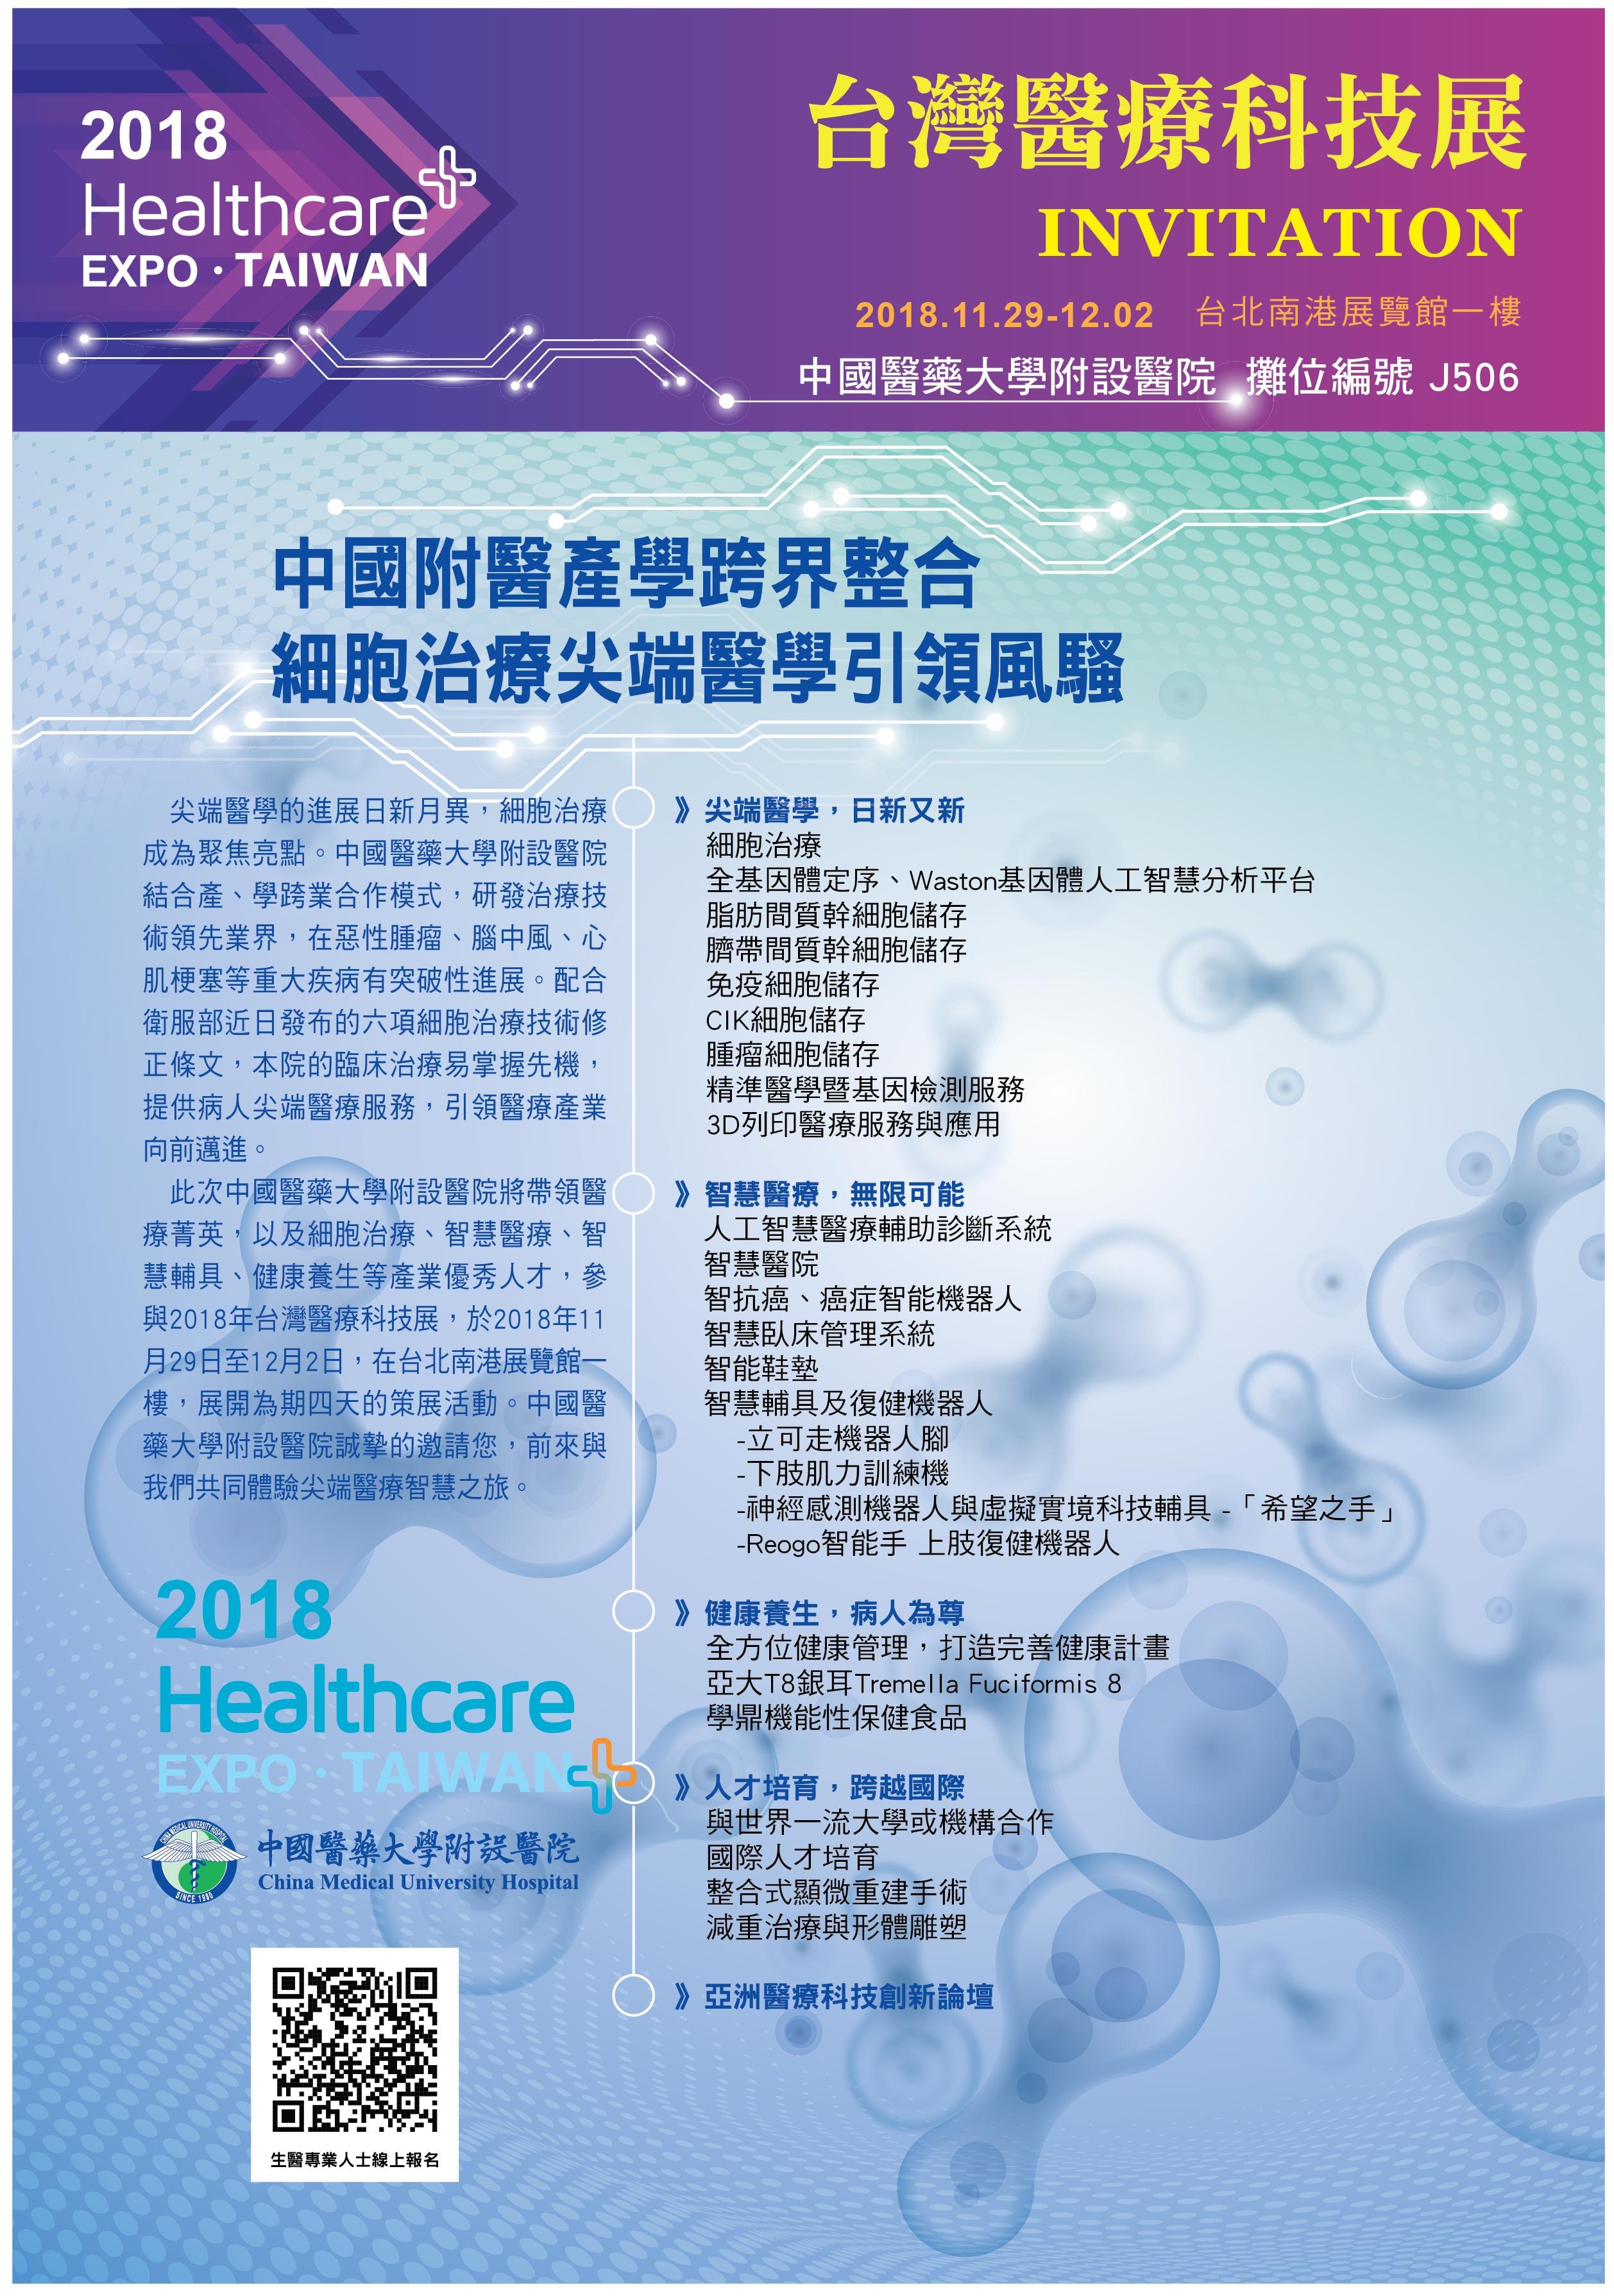 CMUH'sPosterin 2018 Taiwan Healthcare+ Expo